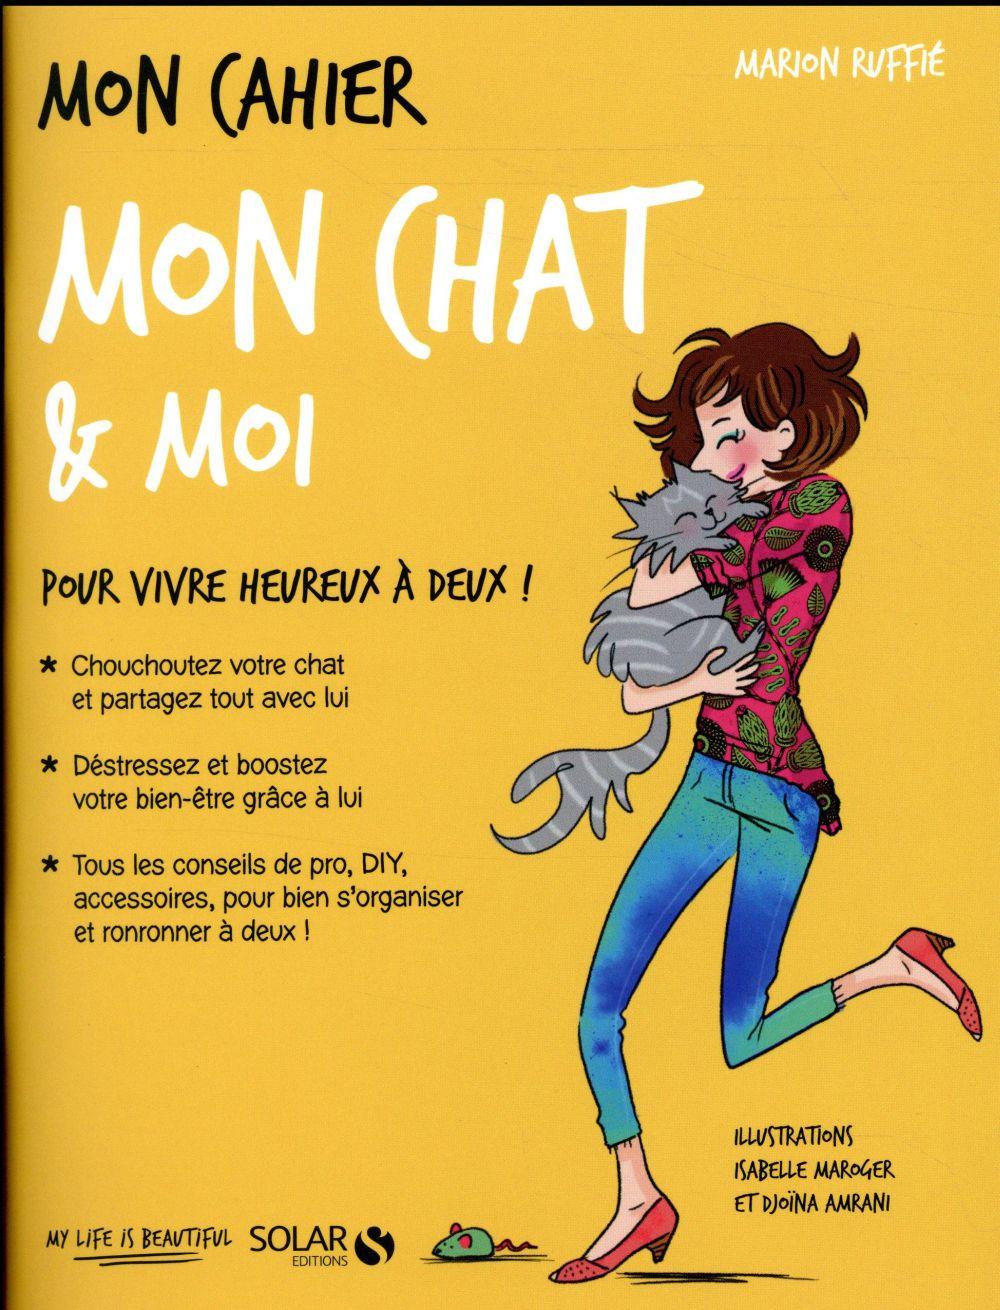 MON CAHIER ; mon chat & moi